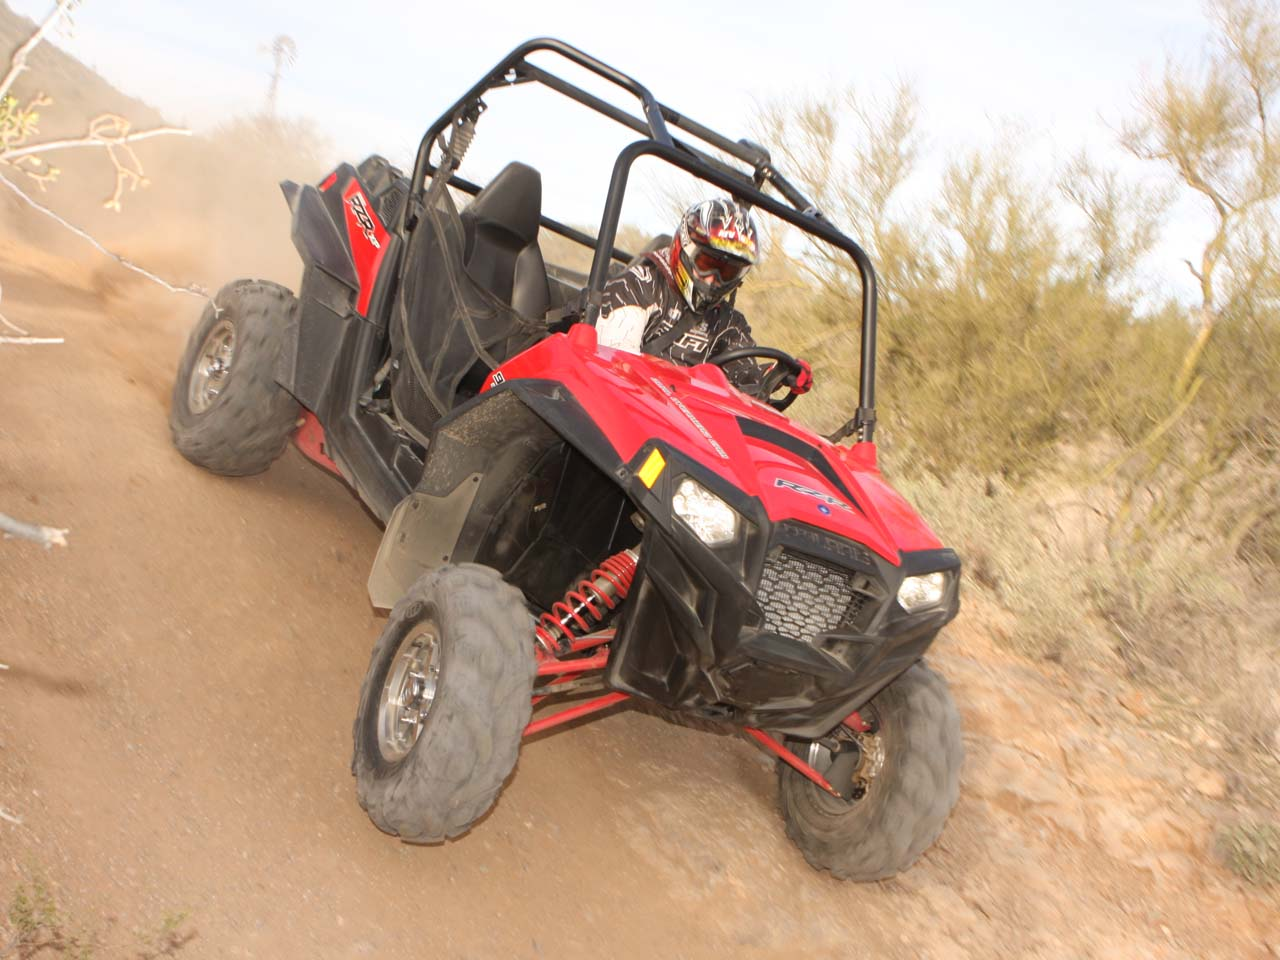 2011.polaris.rzr-xp900.red_.front-right.riding.on-dirt.jpg